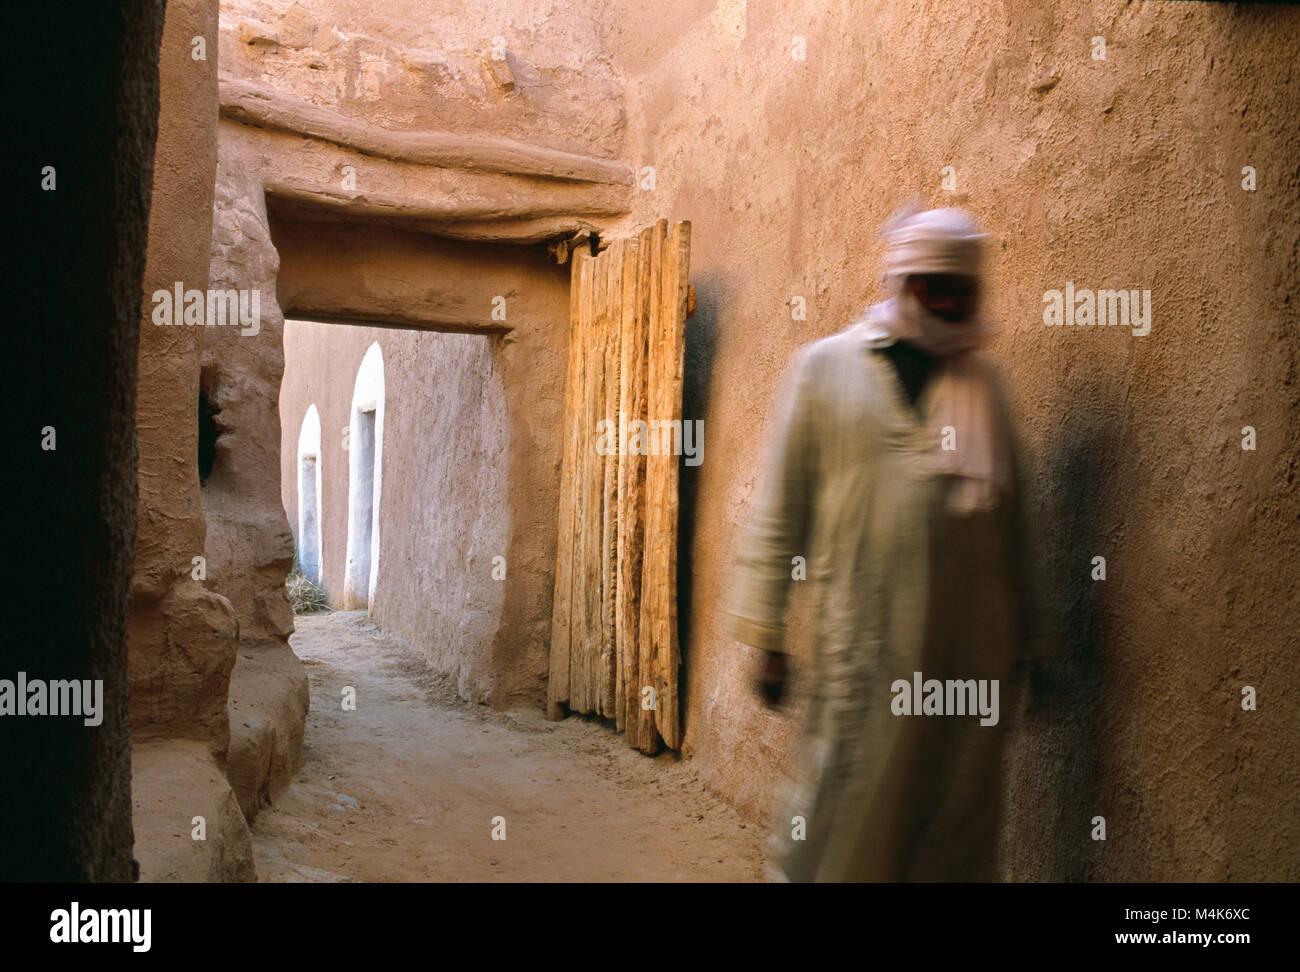 Algeria. Taghit or Tarit. Western Sand Sea. Grand Erg Occidental. Sahara desert. Oasis. Man walking in village. - Stock Image